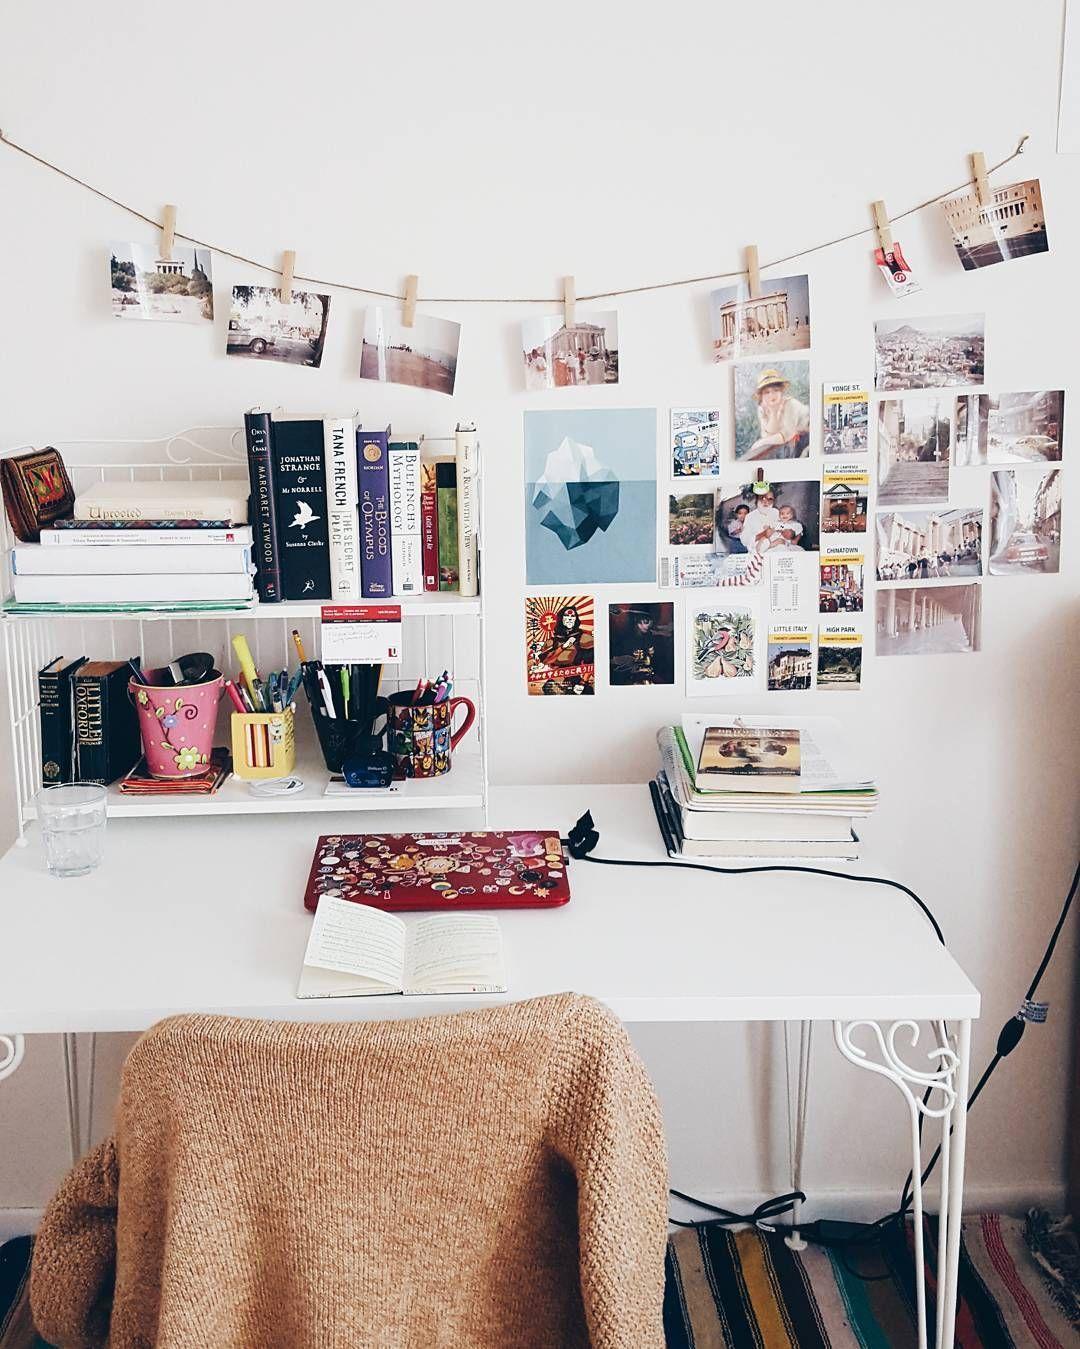 Pinterest Isobelrosec Dorm Room Decor Dorm Room Diy Room Inspiration